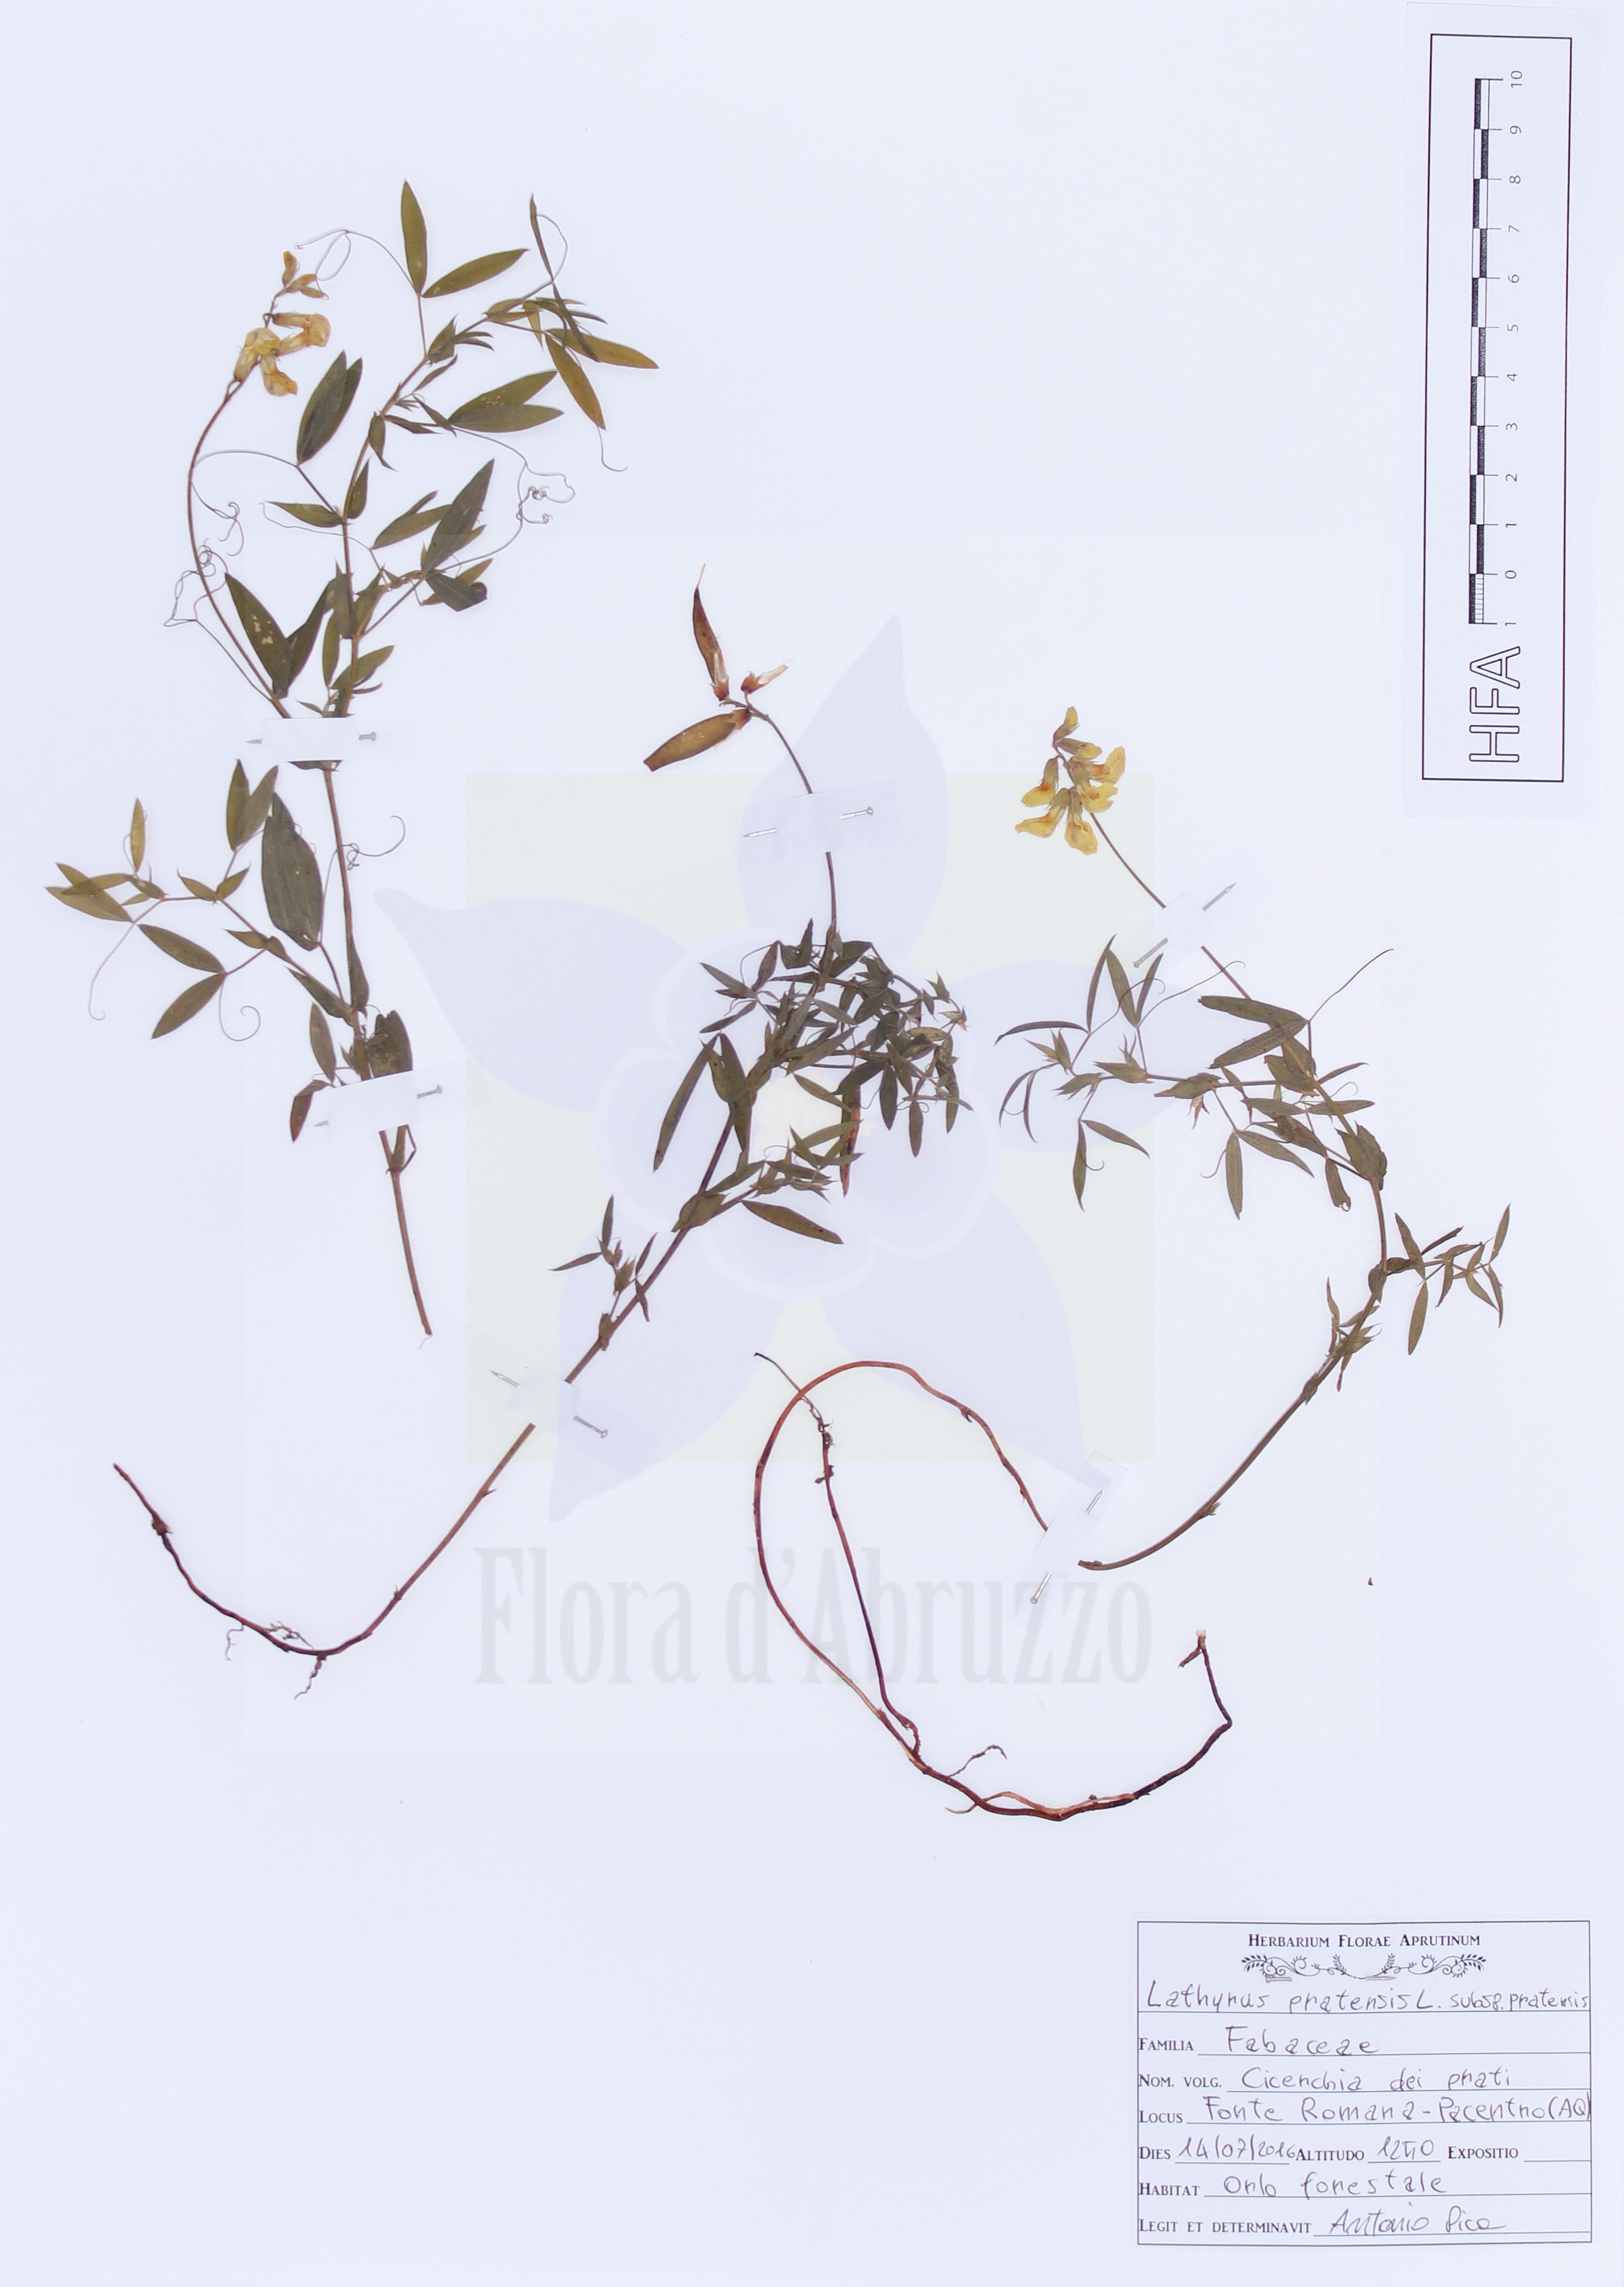 Lathyrus pratensis L. susbp. Pratensis